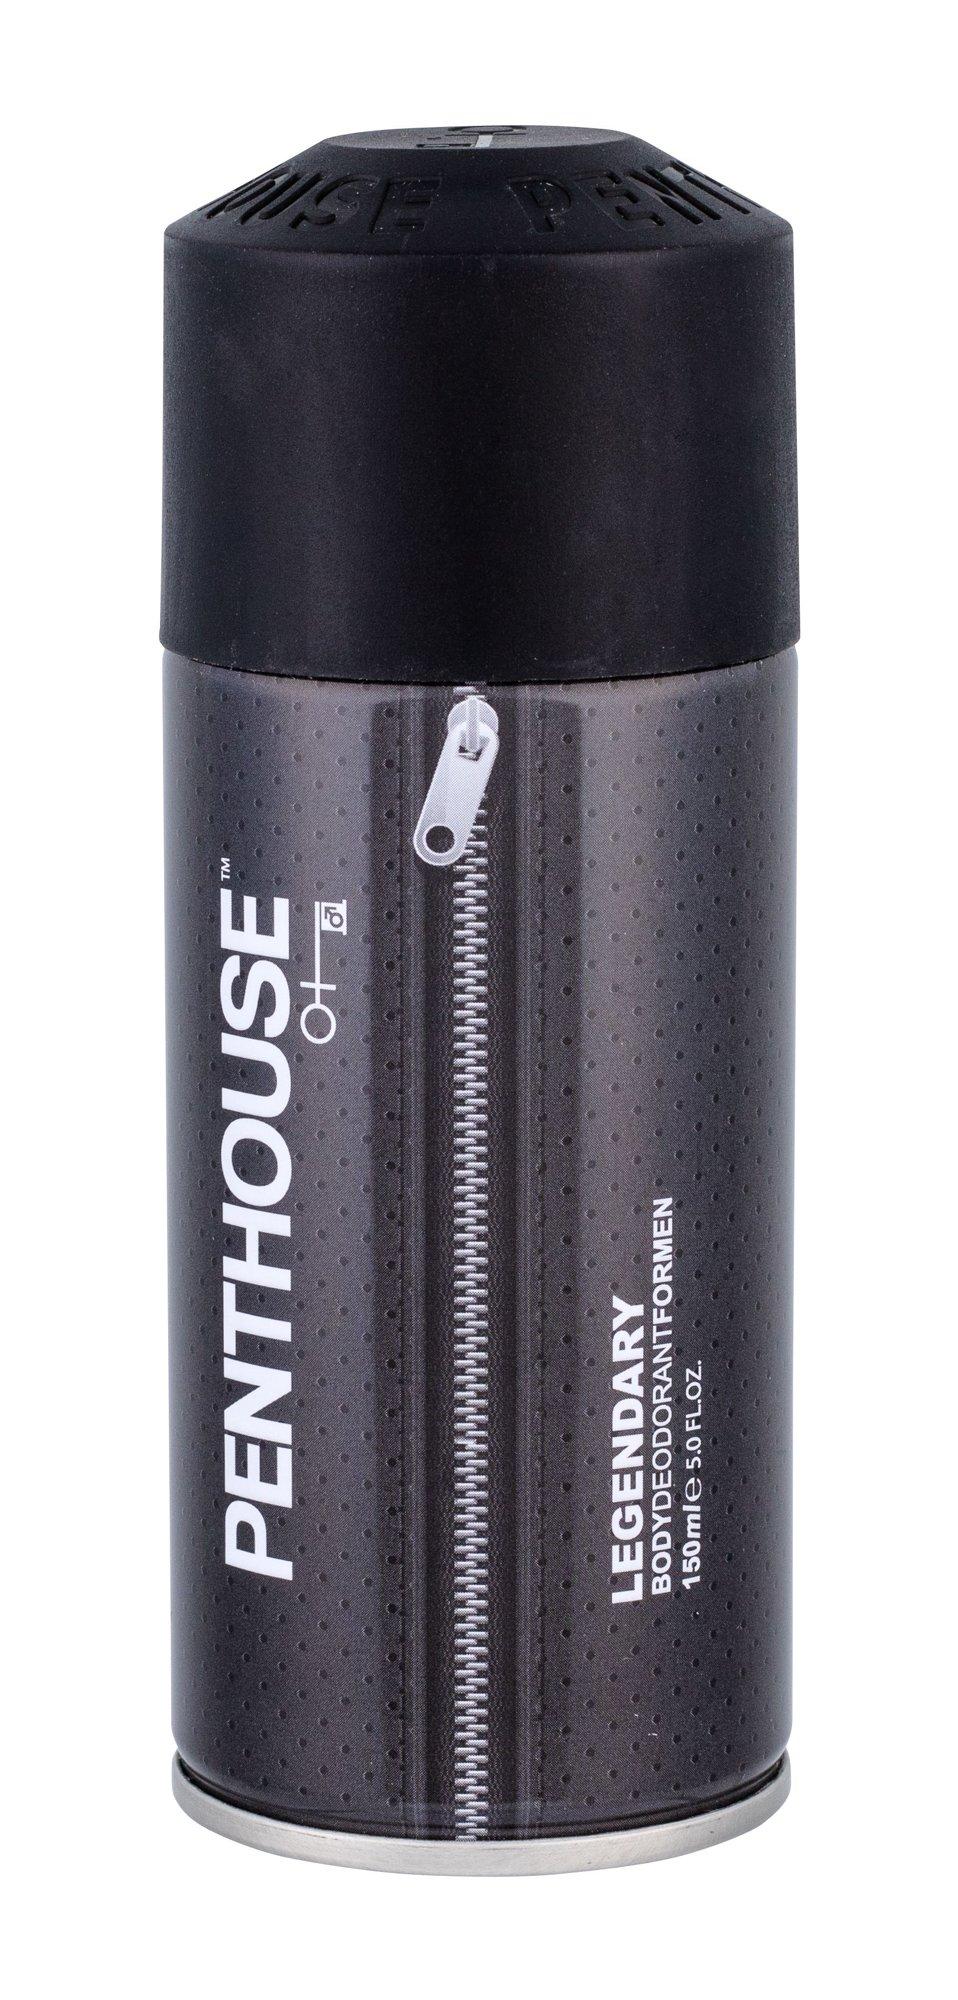 Penthouse Legendary Deodorant 150ml